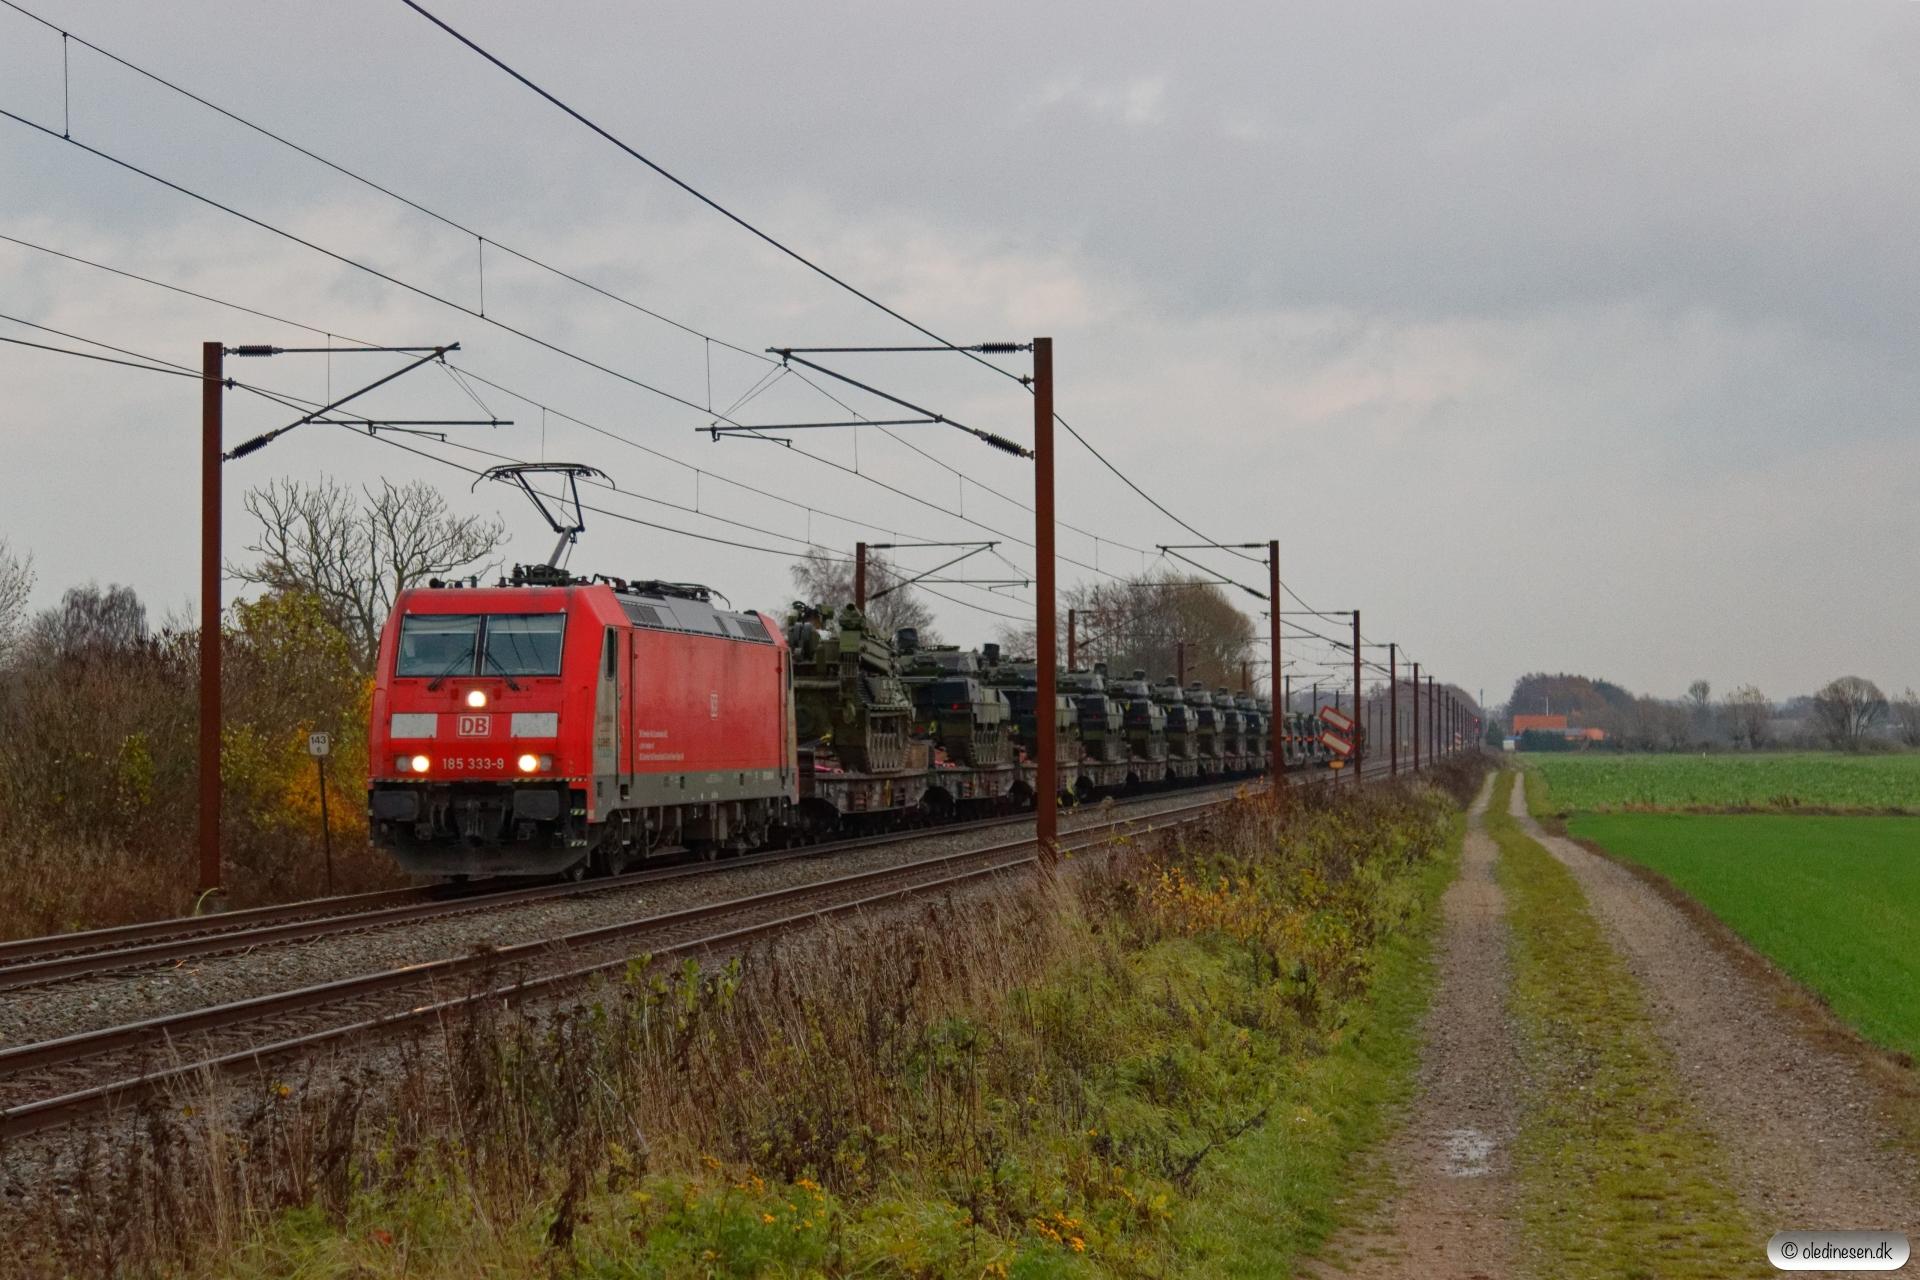 DB 185 333-9 med G 63207 Mgb-Fa. Km 143,6 Kh (Ullerslev-Langeskov) 13.11.2018.